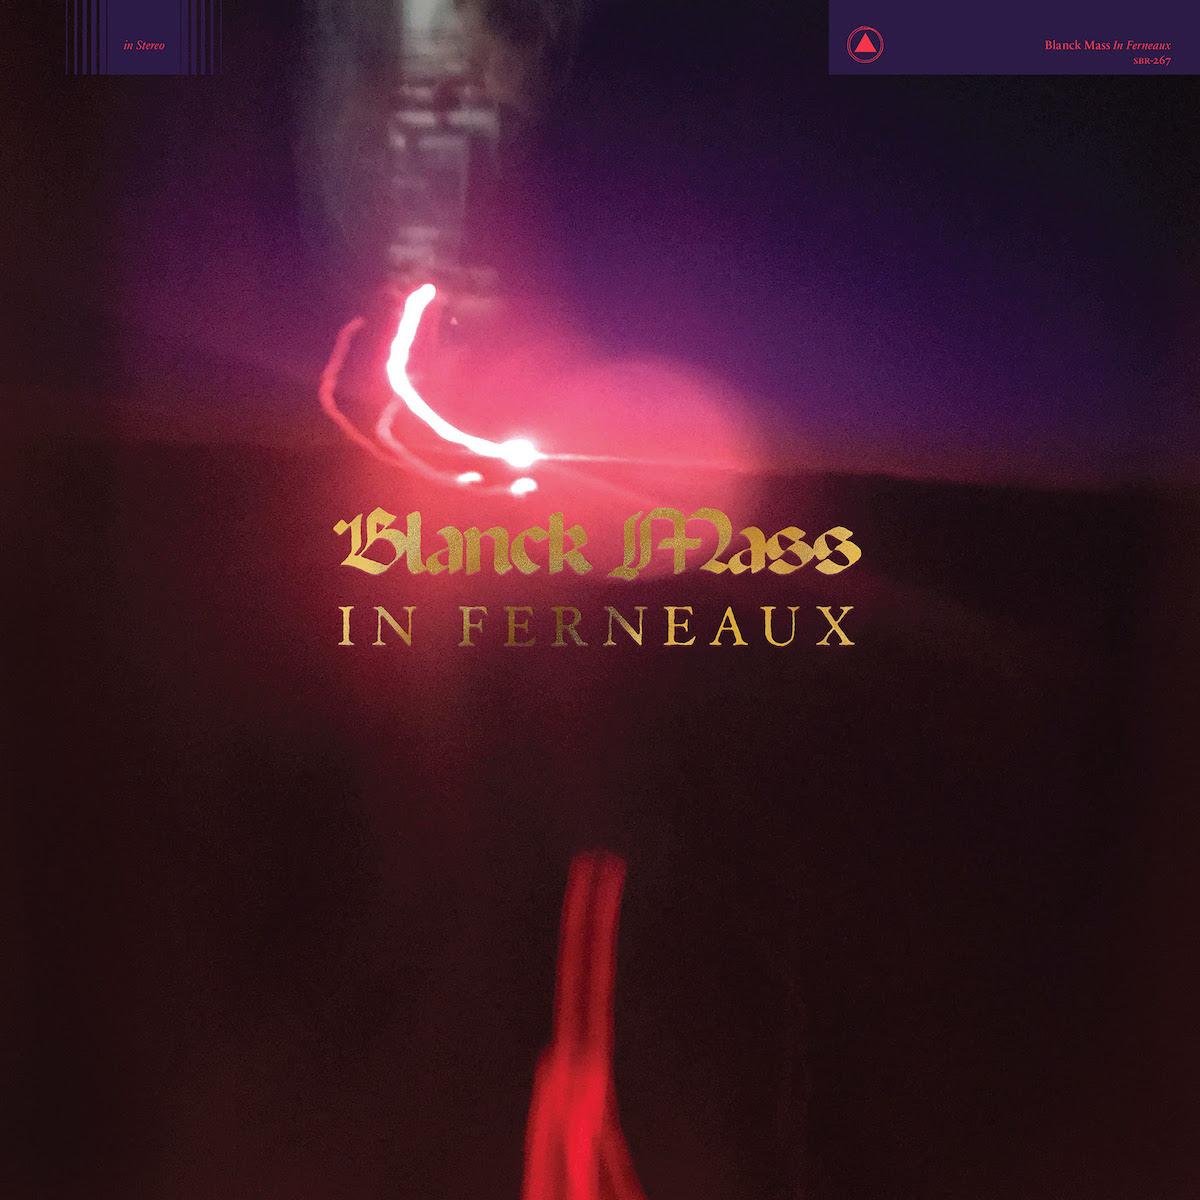 blanck mass in ferneaux album cover art Blanck Mass Announces New Album In Ferneaux, Shares Starstuff: Stream